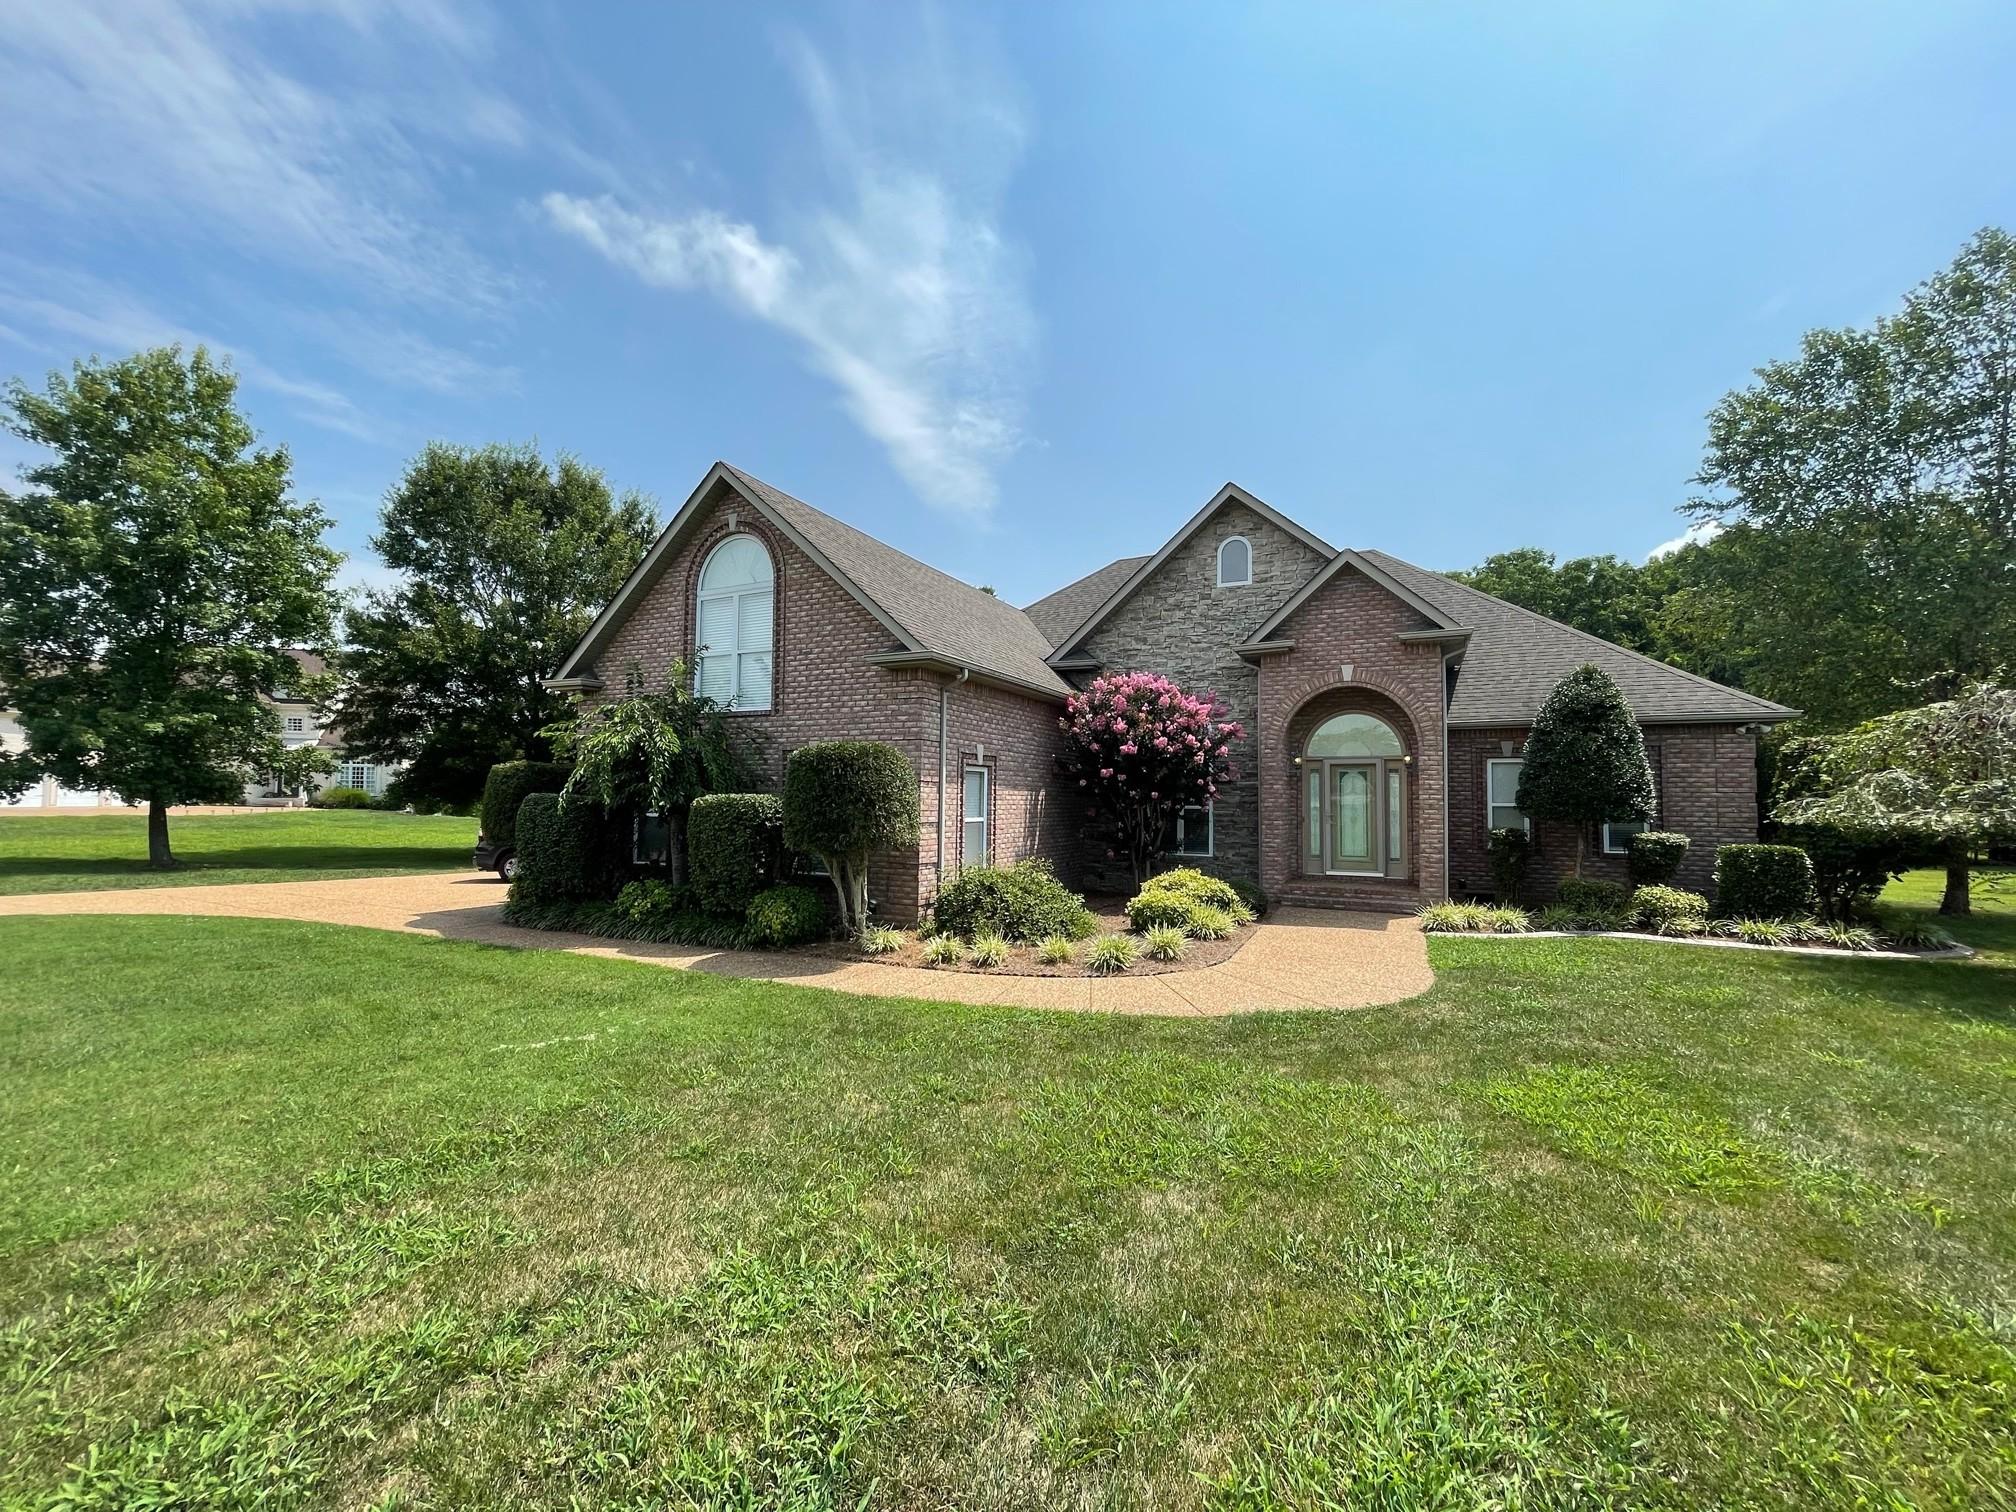 508 Barton Shore Ct Property Photo 1